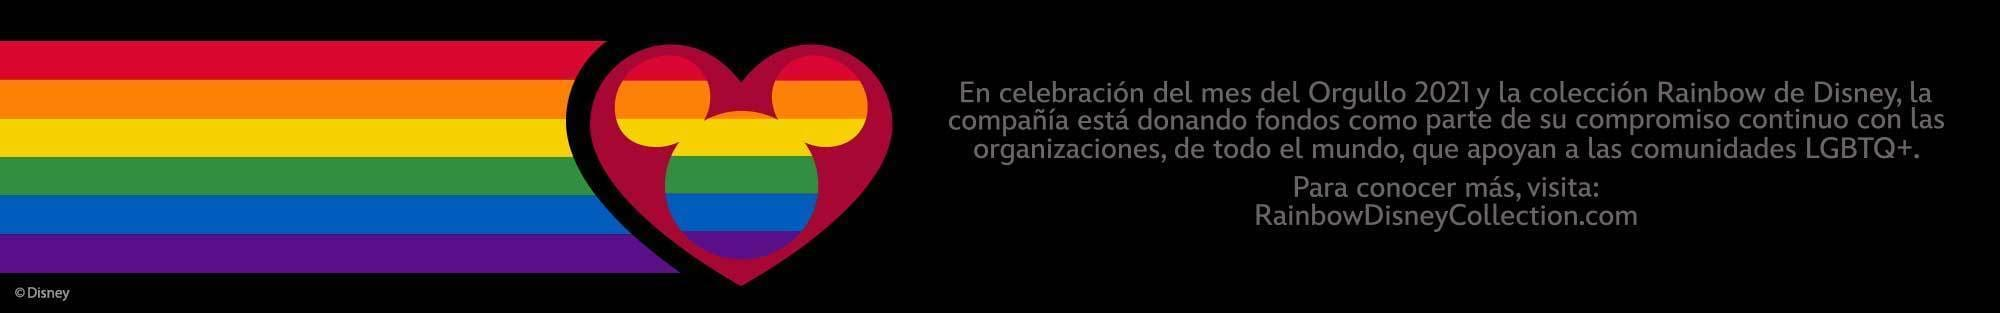 Mid_ShopDisney_Jun21_Rainbow Charity